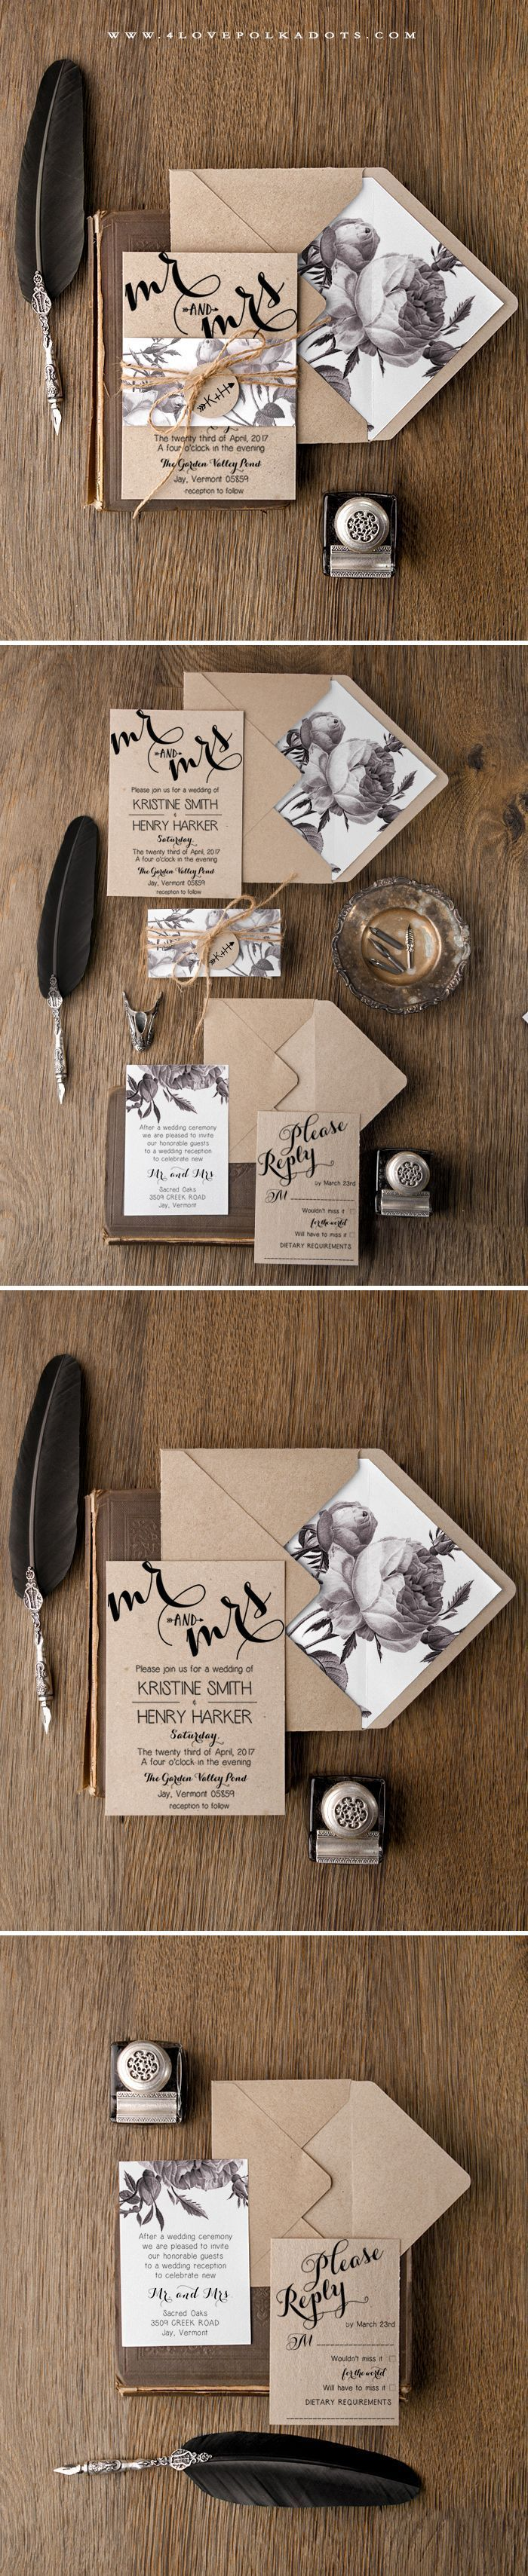 handcrafted wedding stationery uk%0A Handmade Wedding Invitation  Eco Papers  Floral Printing  u     Calligraphy  writing  weddingideas  boho